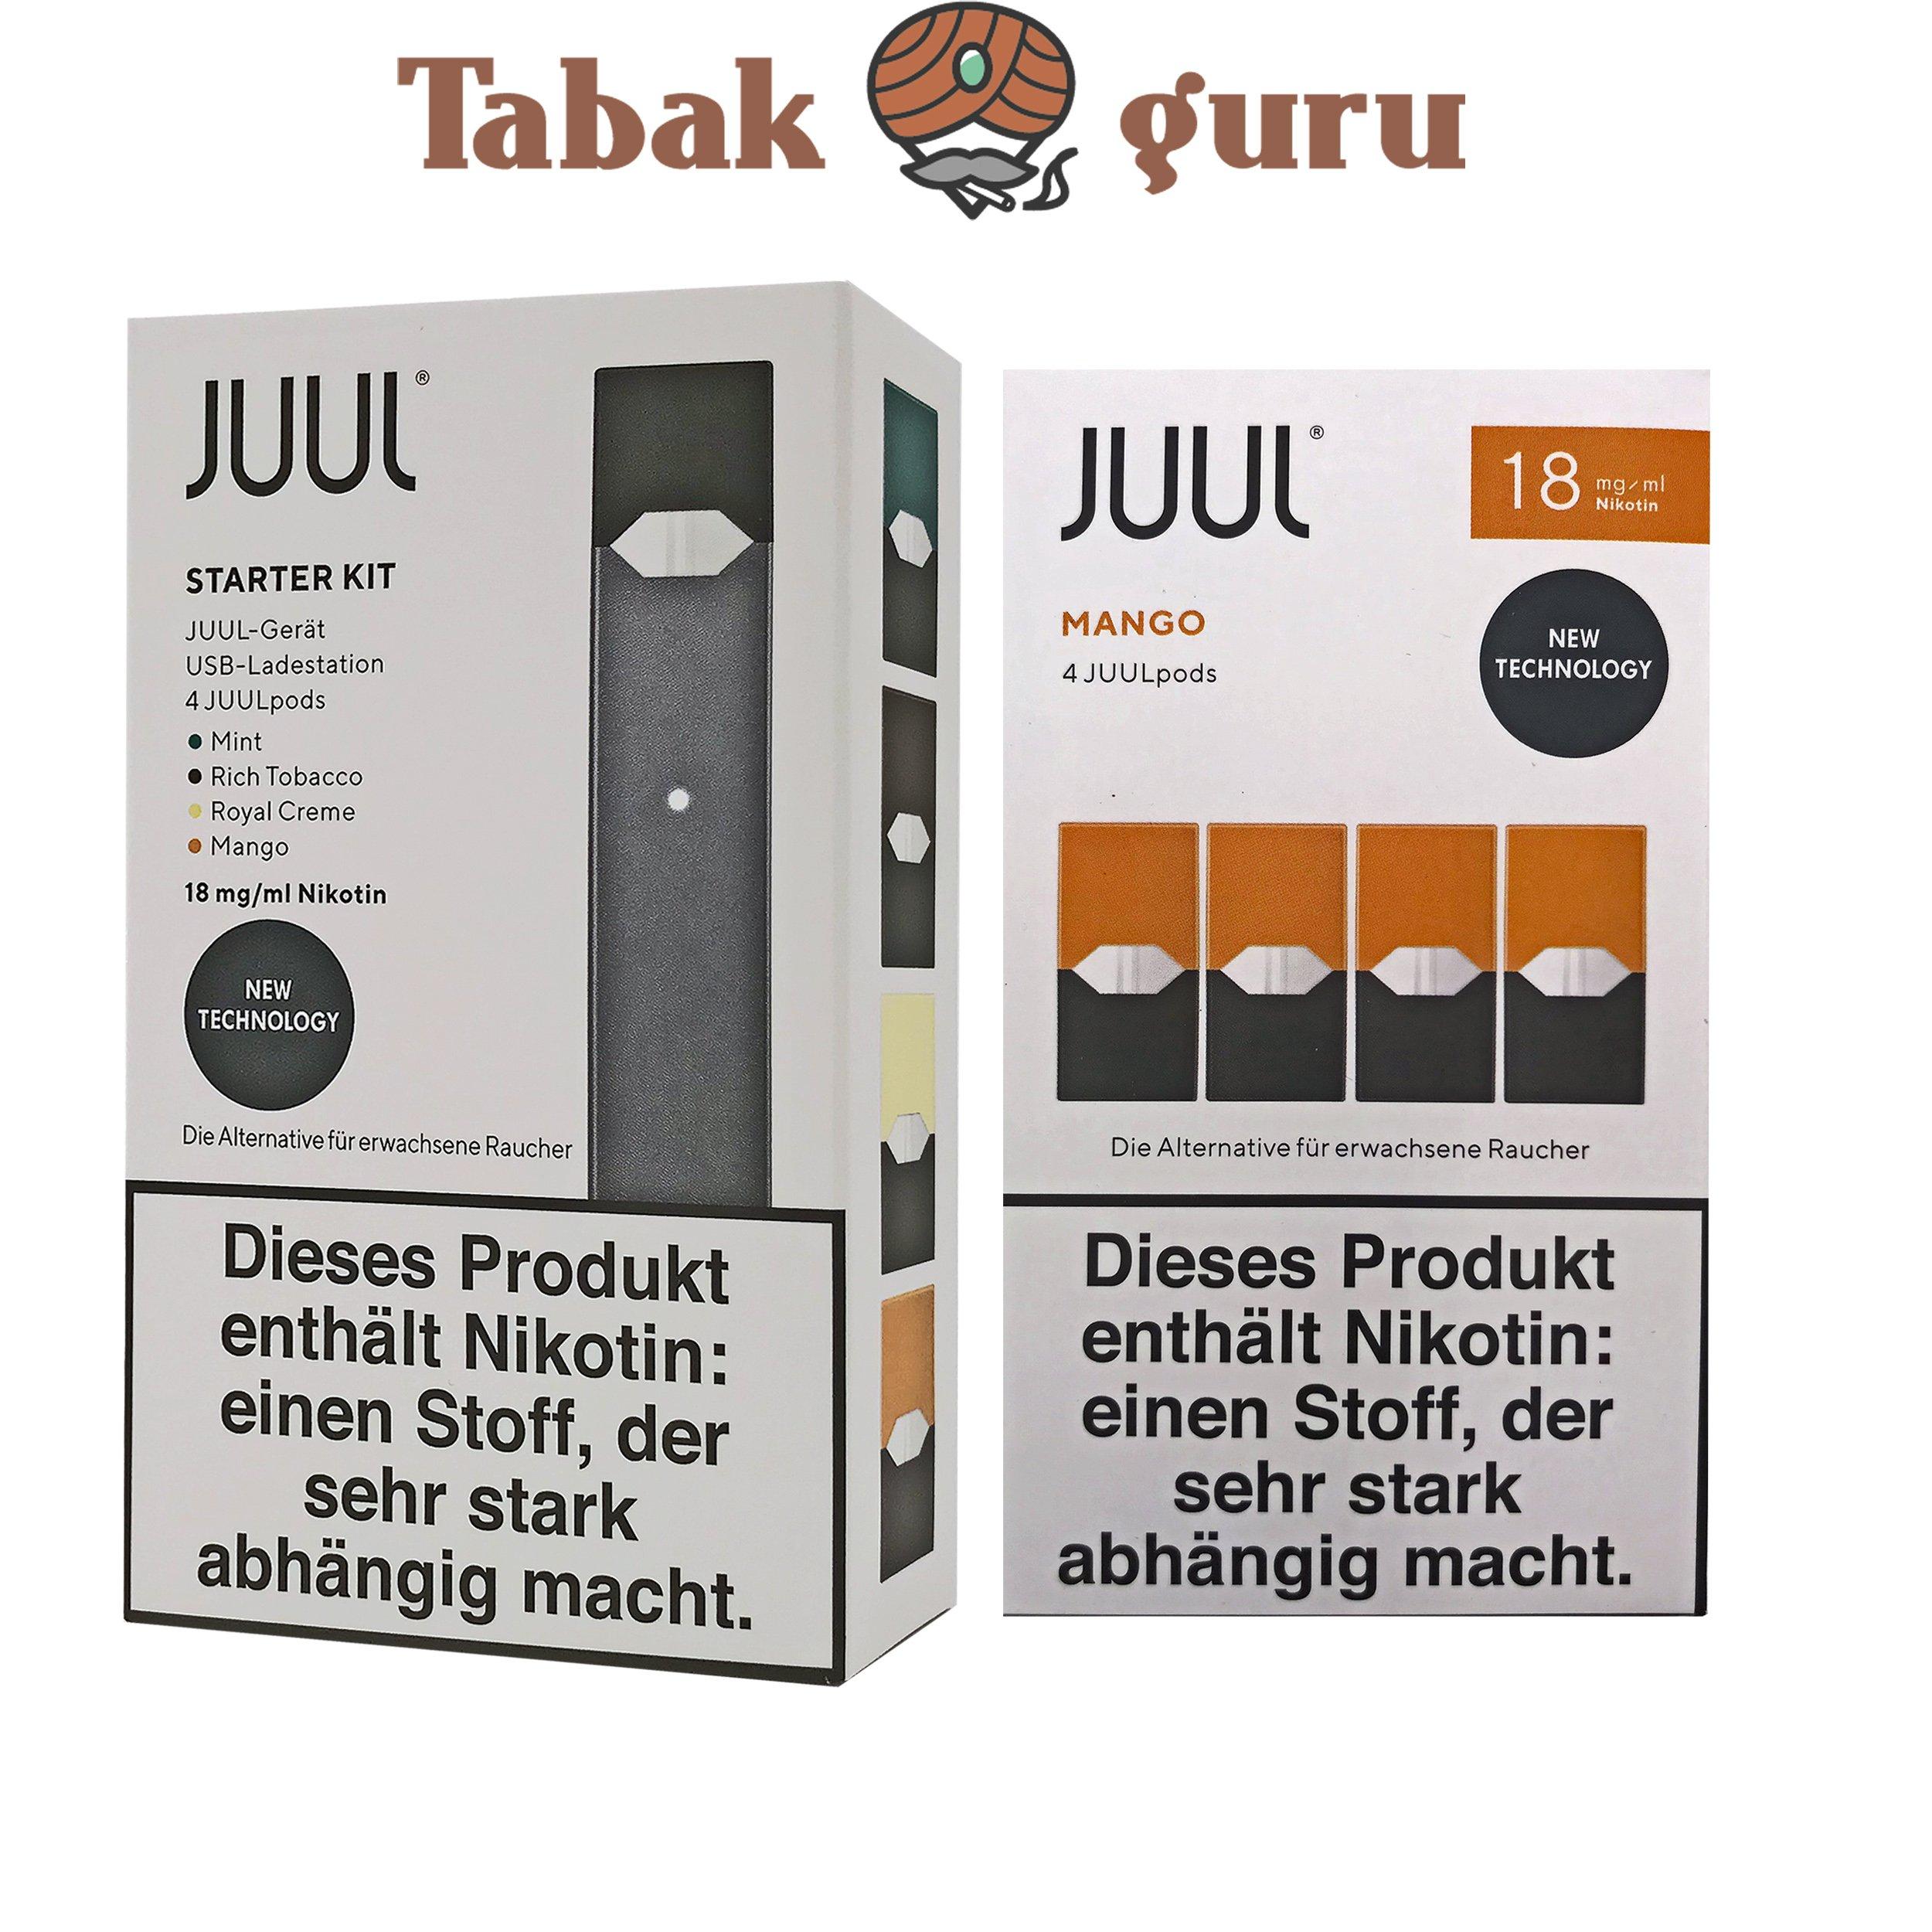 JUUL Starter-Kit mit 4 JUULpods Inkl. 4 JUUL pods Mango 18mg